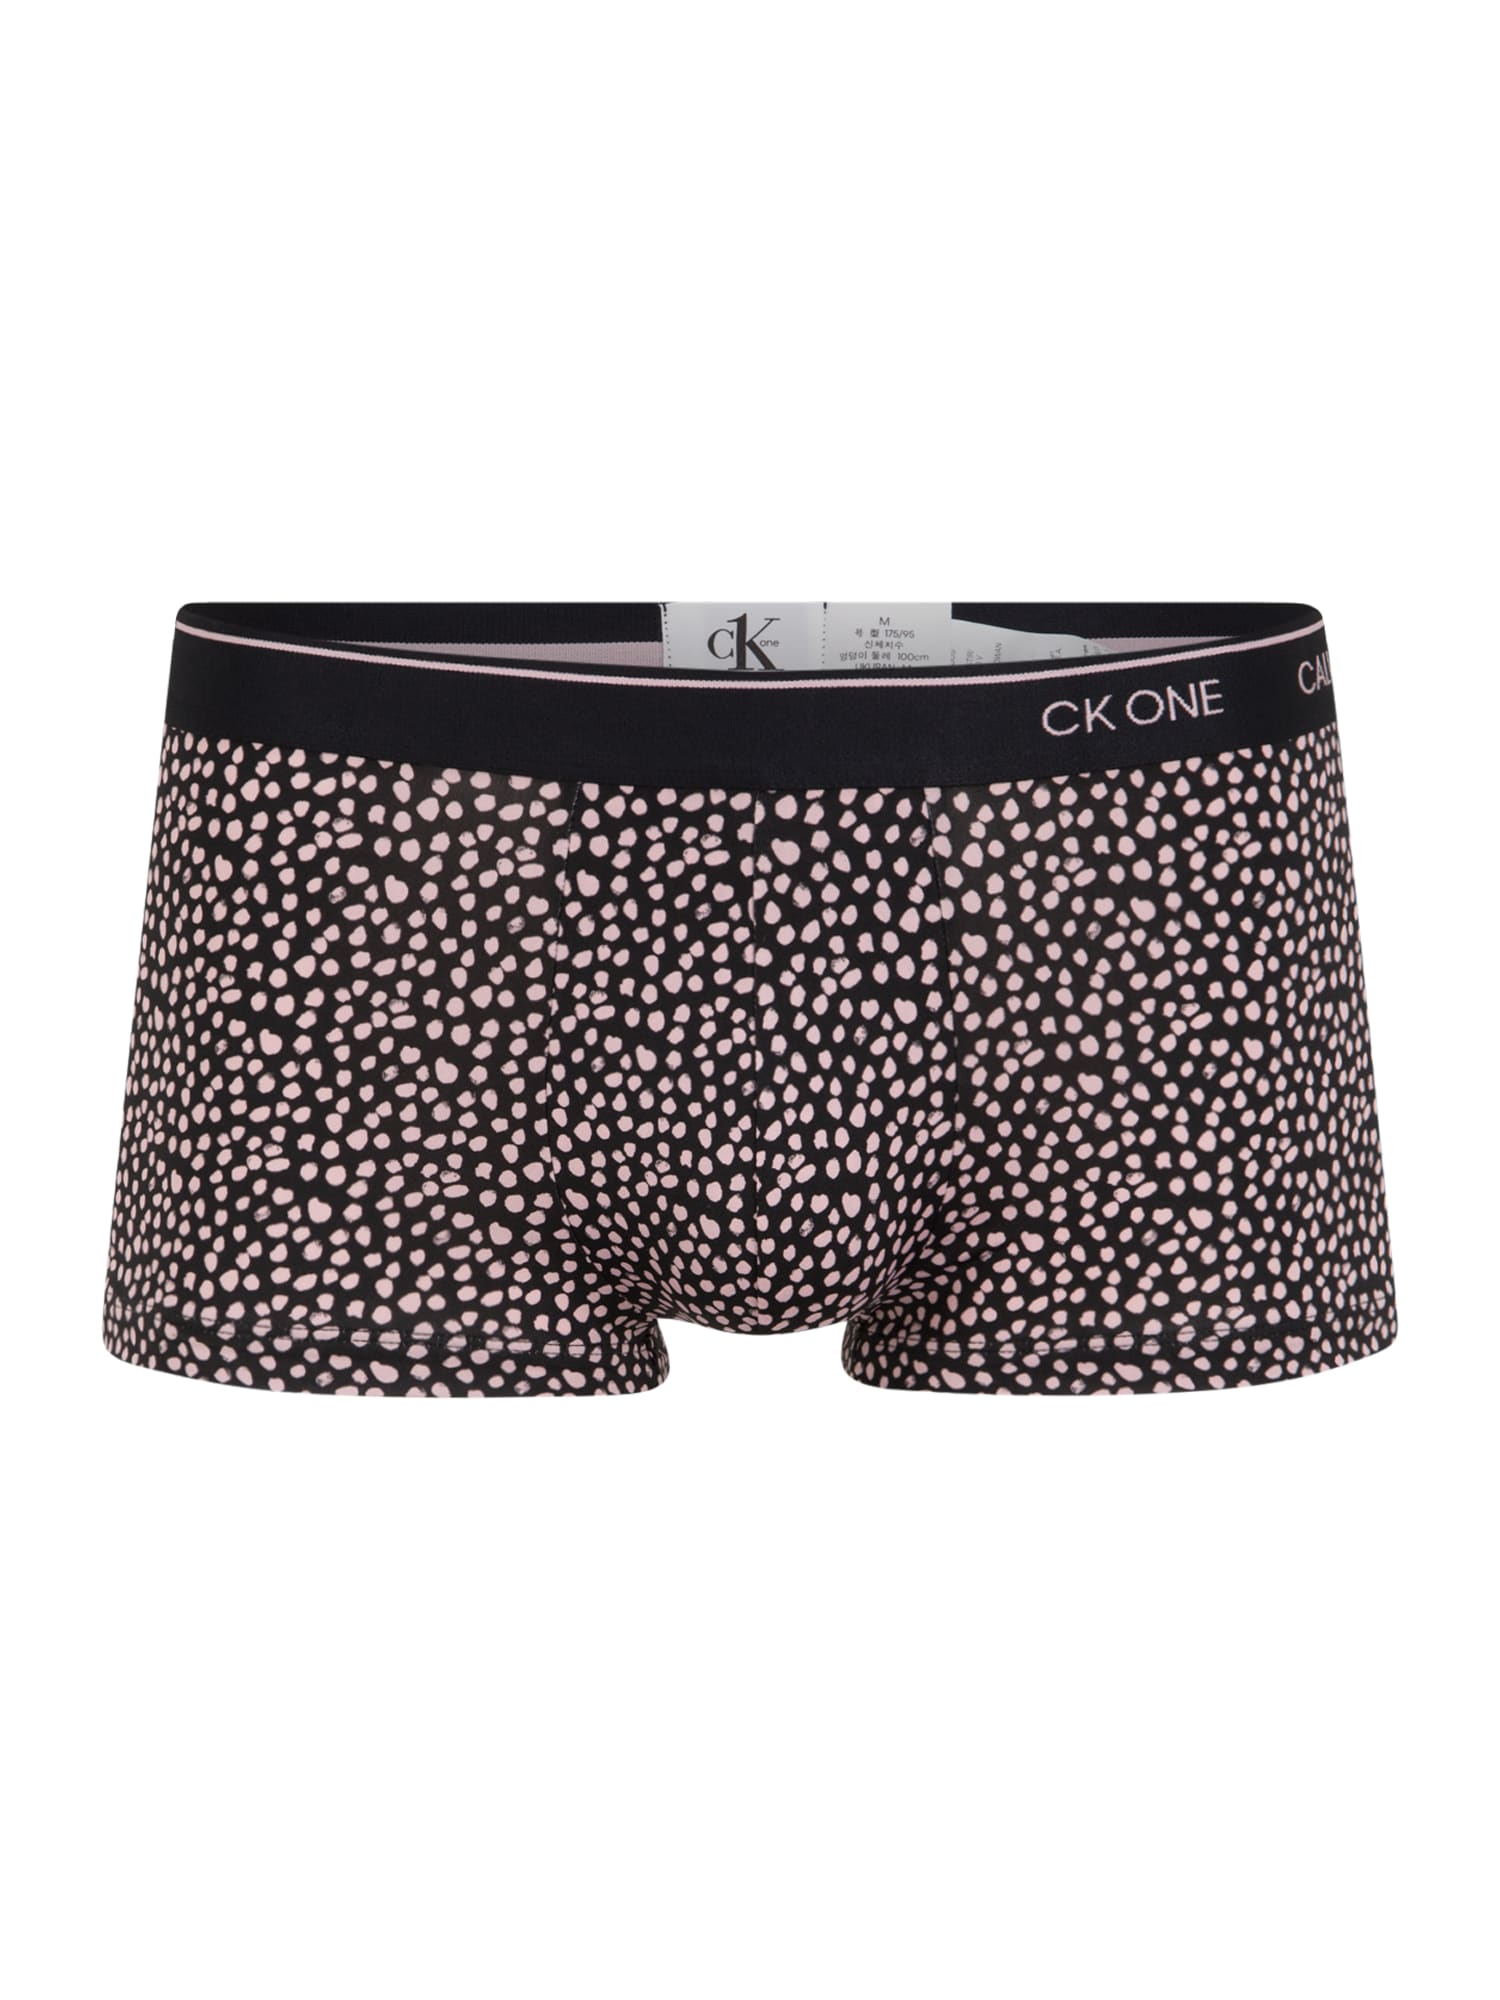 Calvin Klein Underwear Boxer trumpikės rožių spalva / juoda